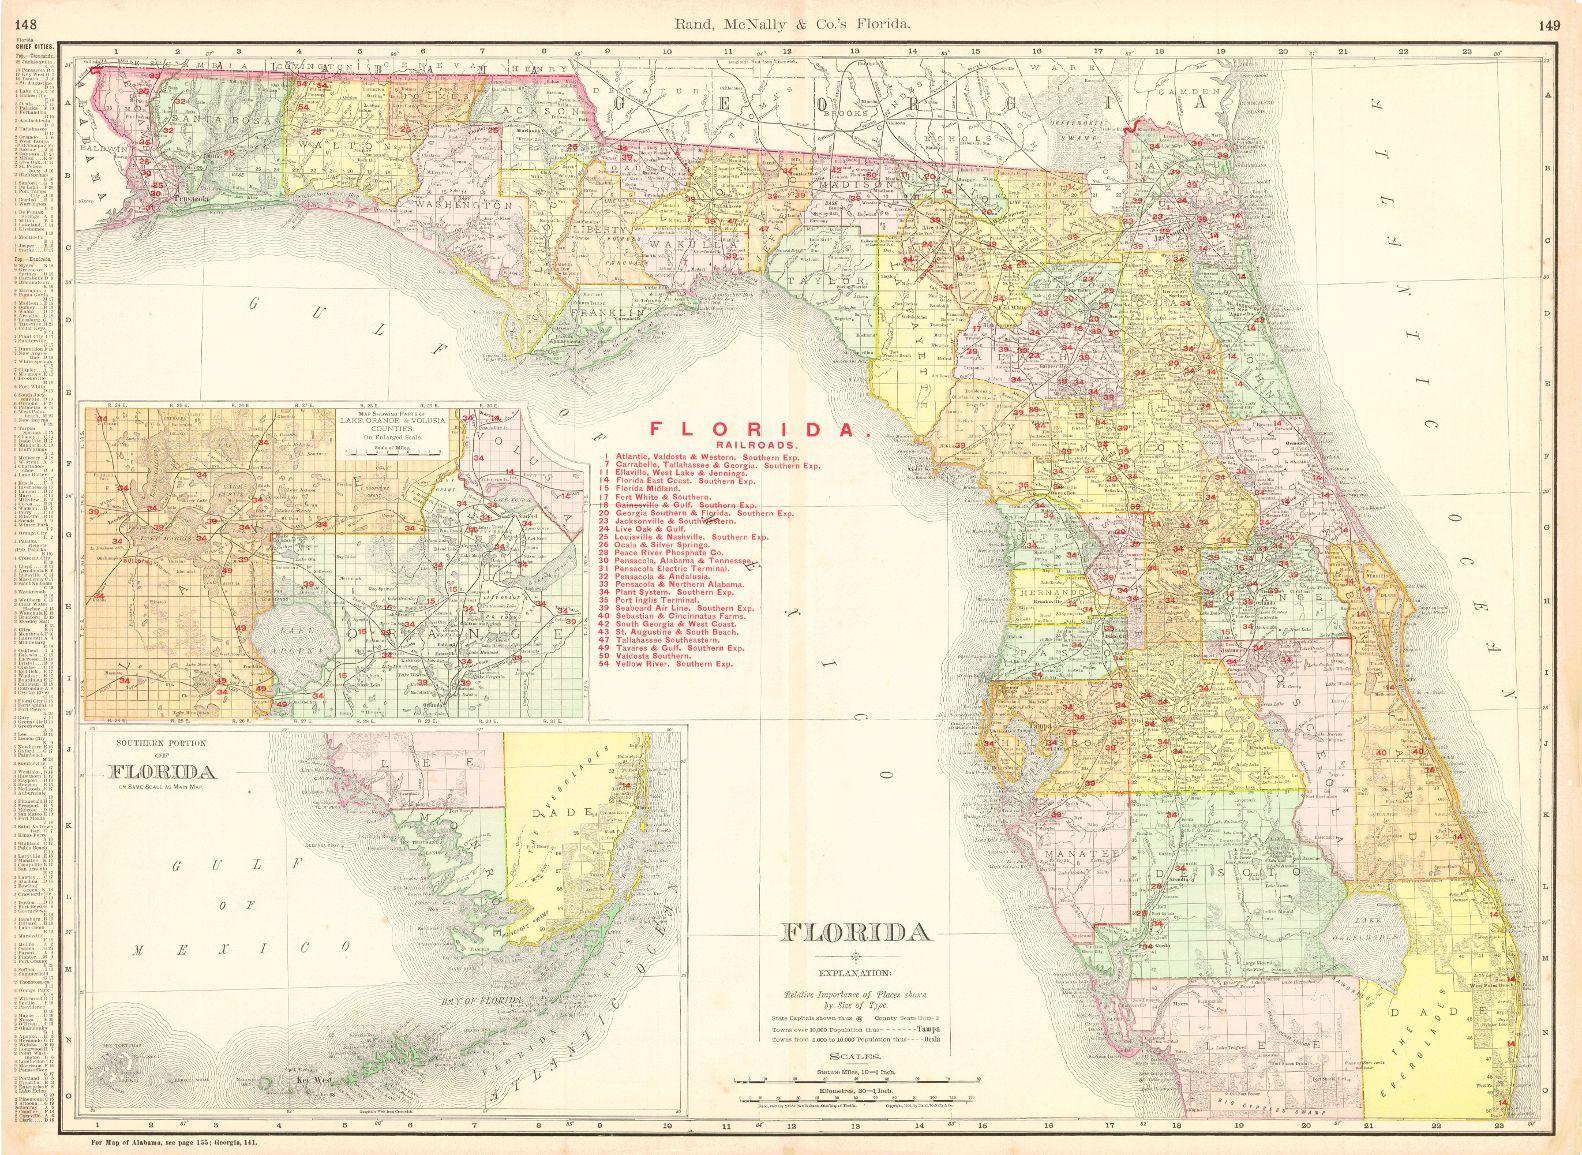 Rand Mcnally Map Of Florida.Florida Rand Mcnally Co C1892 311 Their New Business Atlas